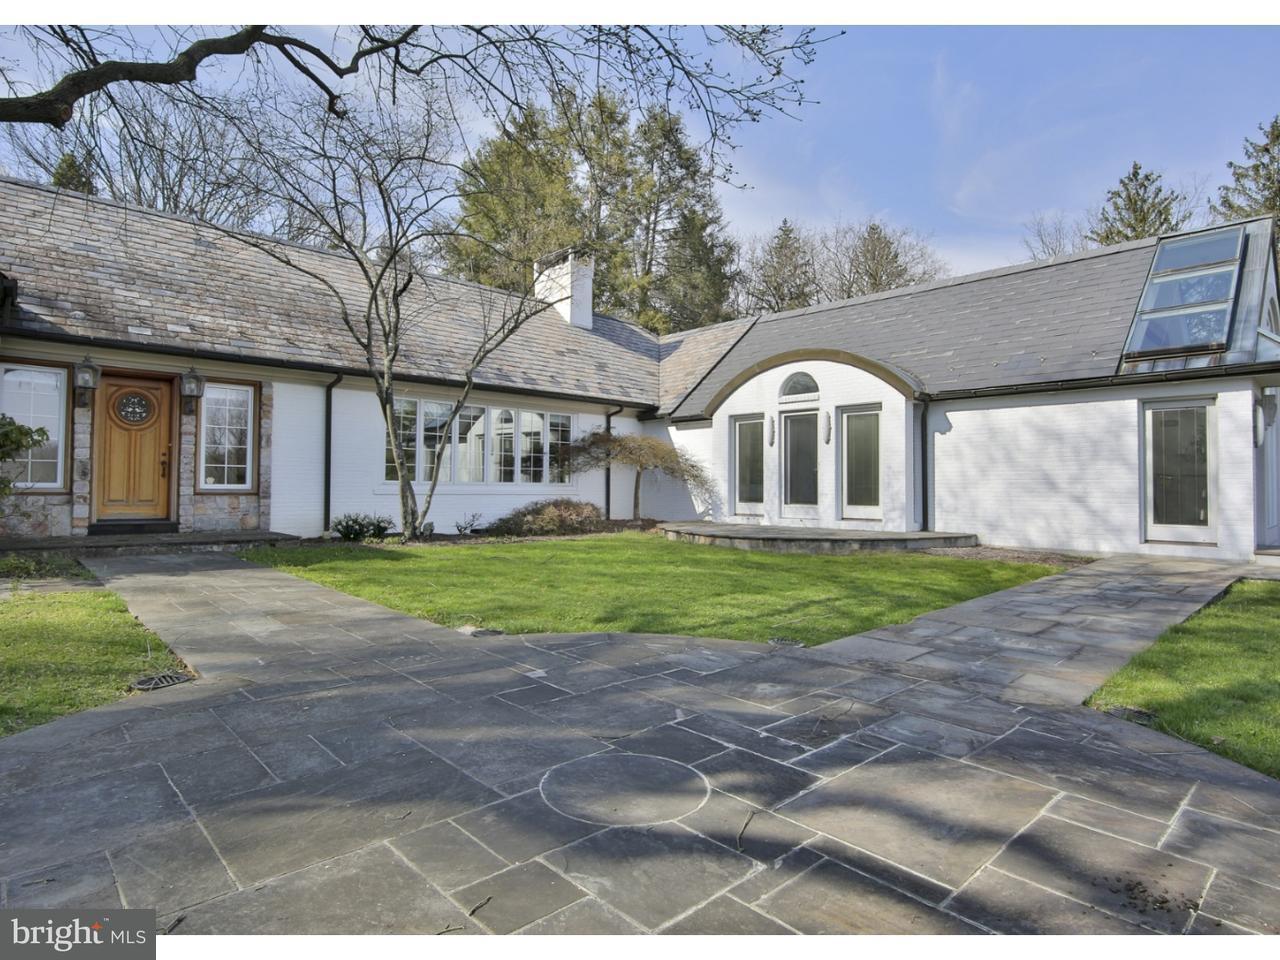 Single Family Home for Sale at 3548 BINGEN Road Bethlehem, Pennsylvania 18015 United States